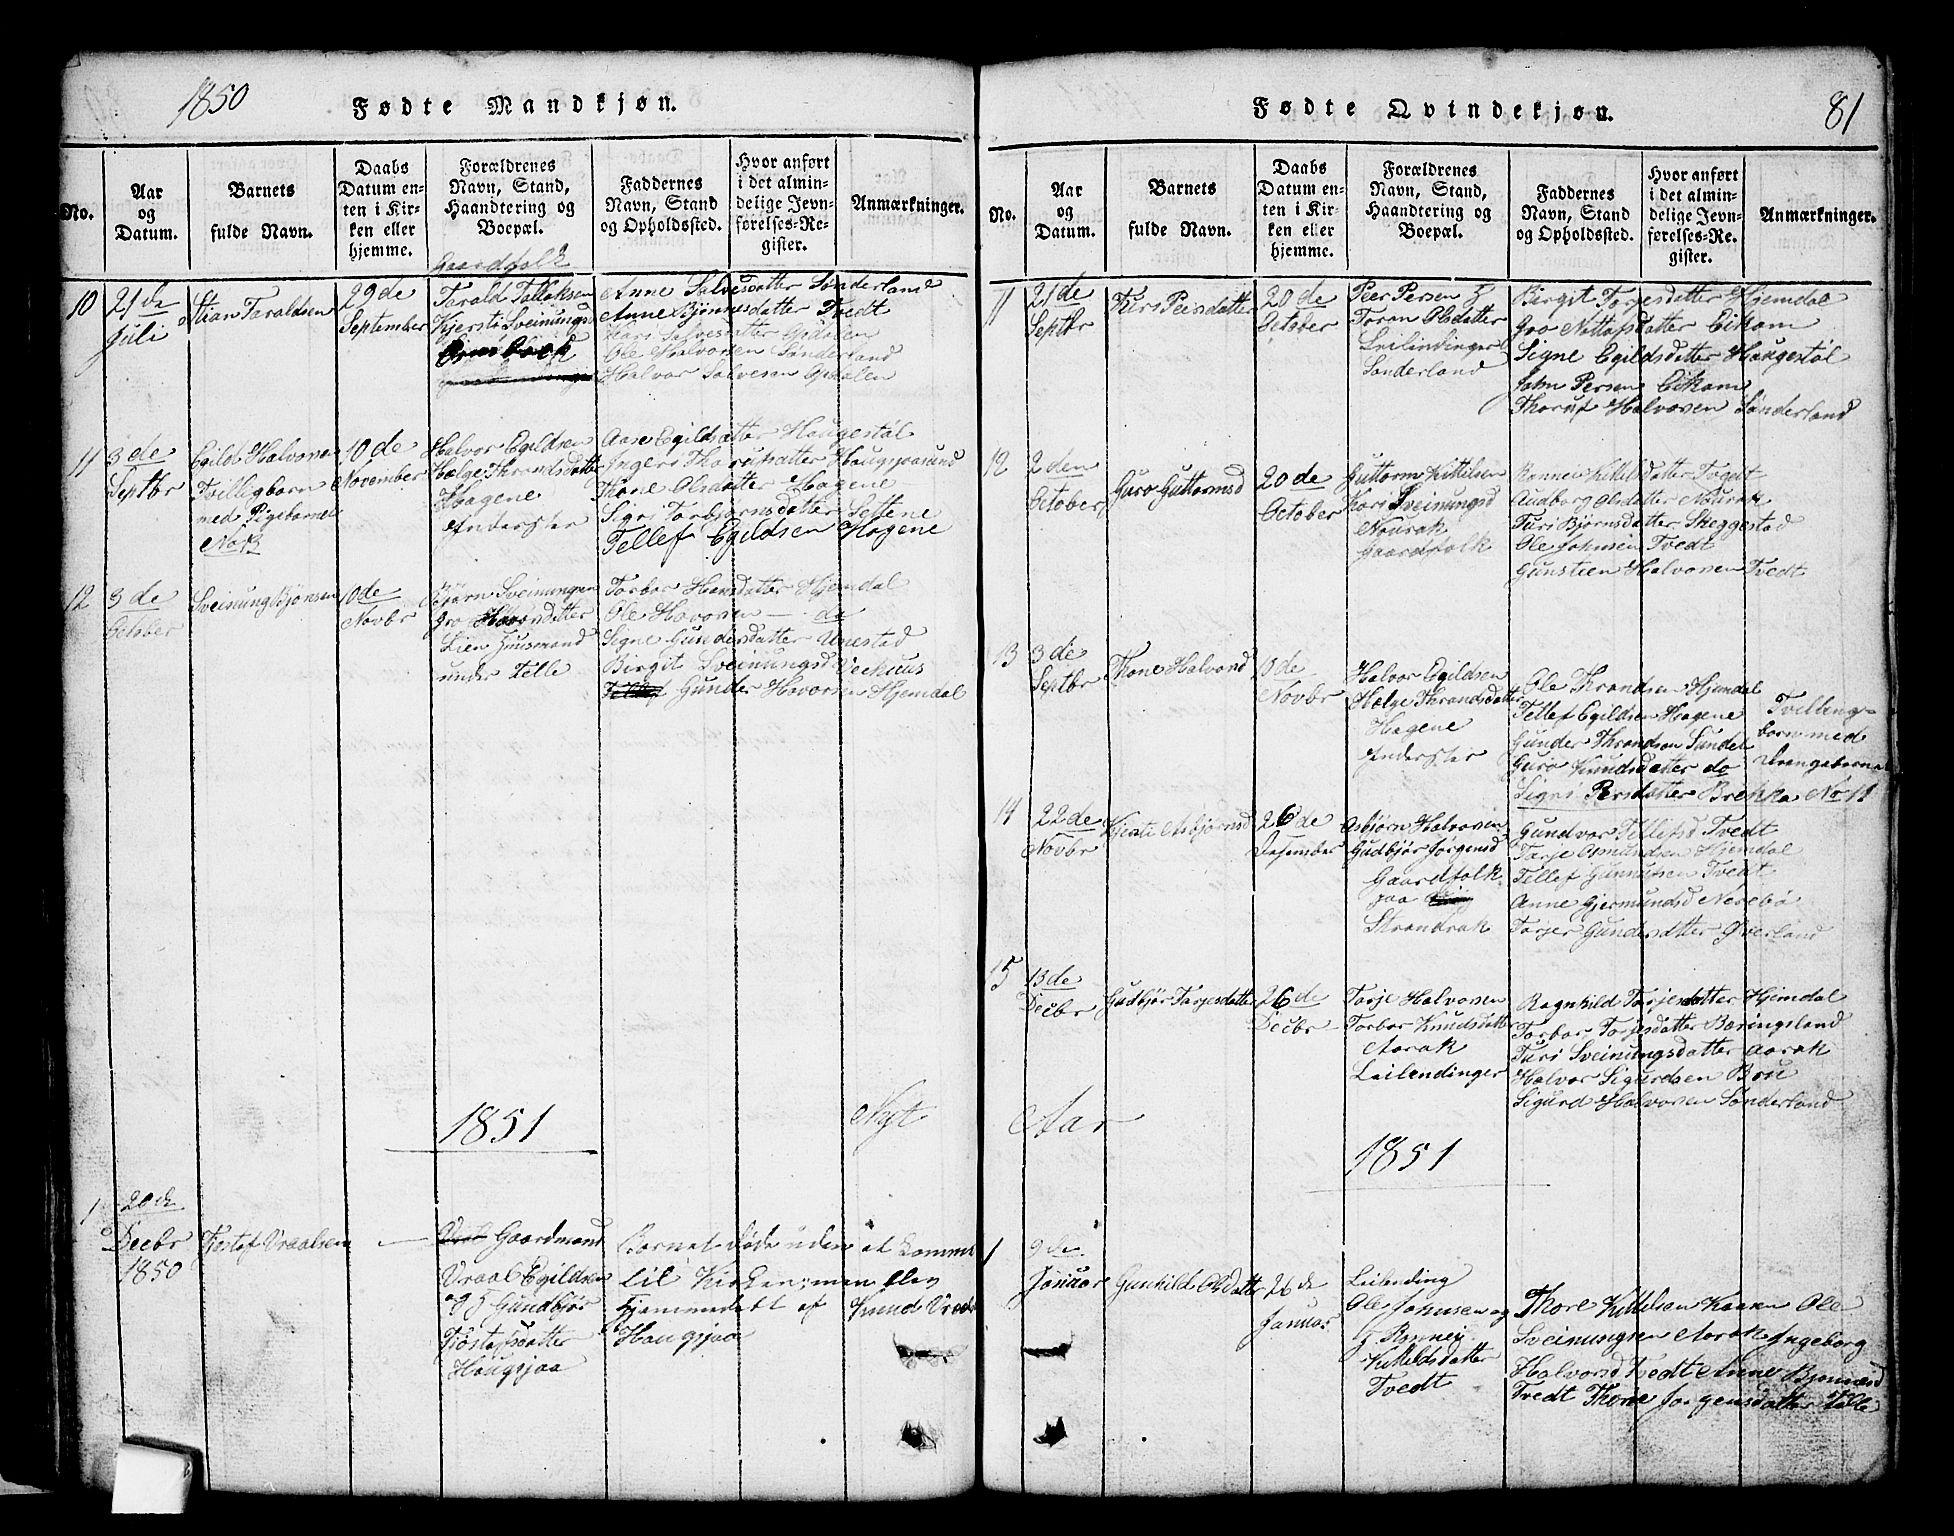 SAKO, Nissedal kirkebøker, G/Gb/L0001: Klokkerbok nr. II 1, 1814-1862, s. 81